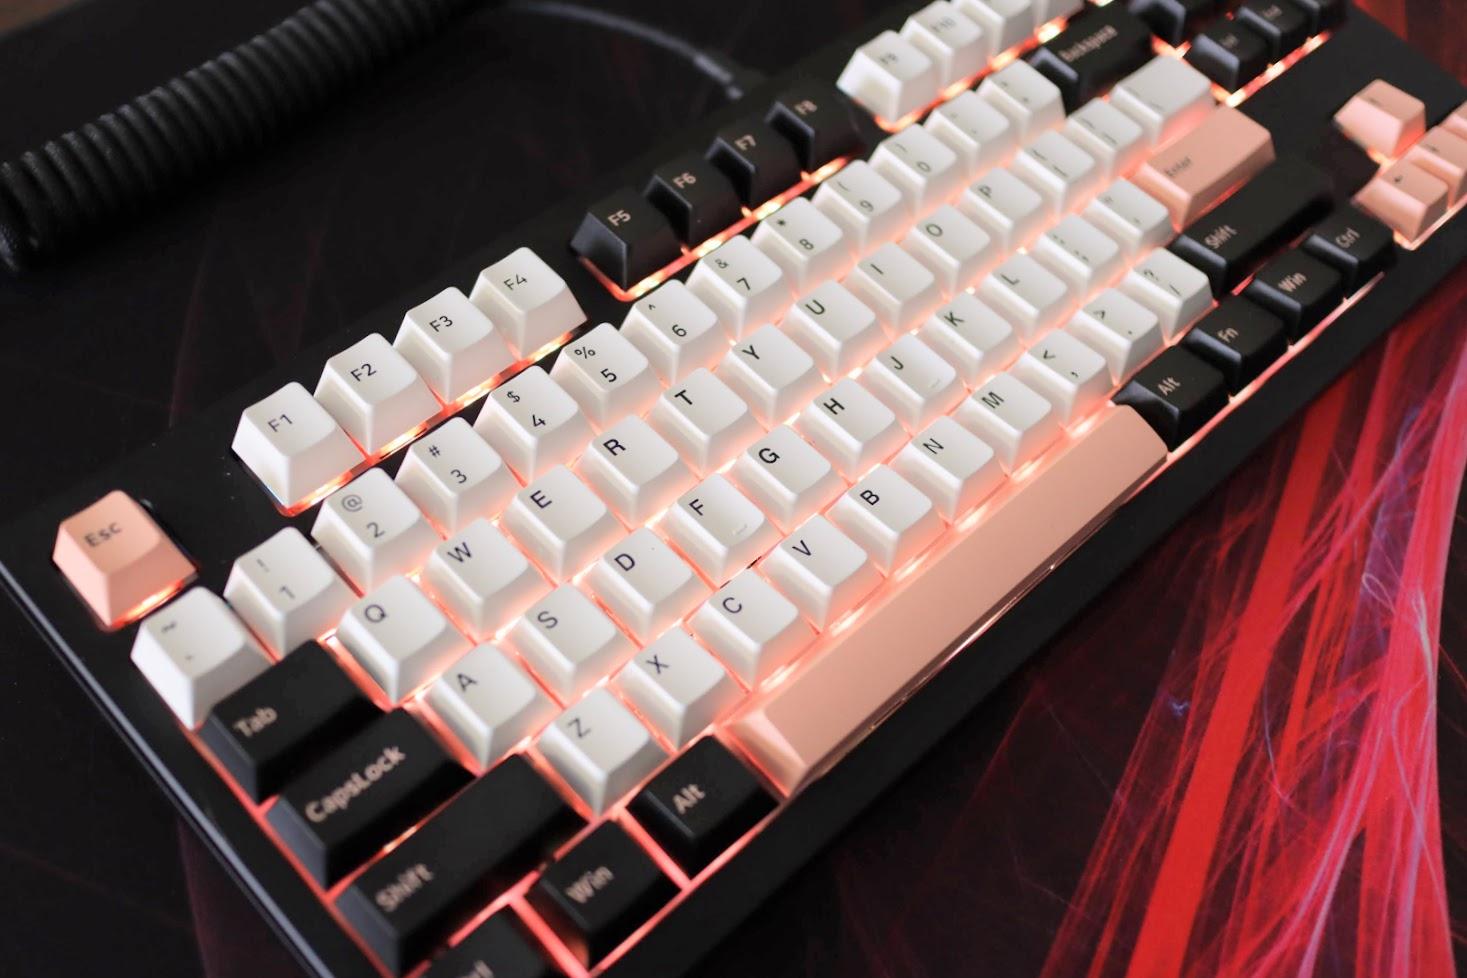 Monstargear XO K80 Aluminum Keyboard Kit Review 2